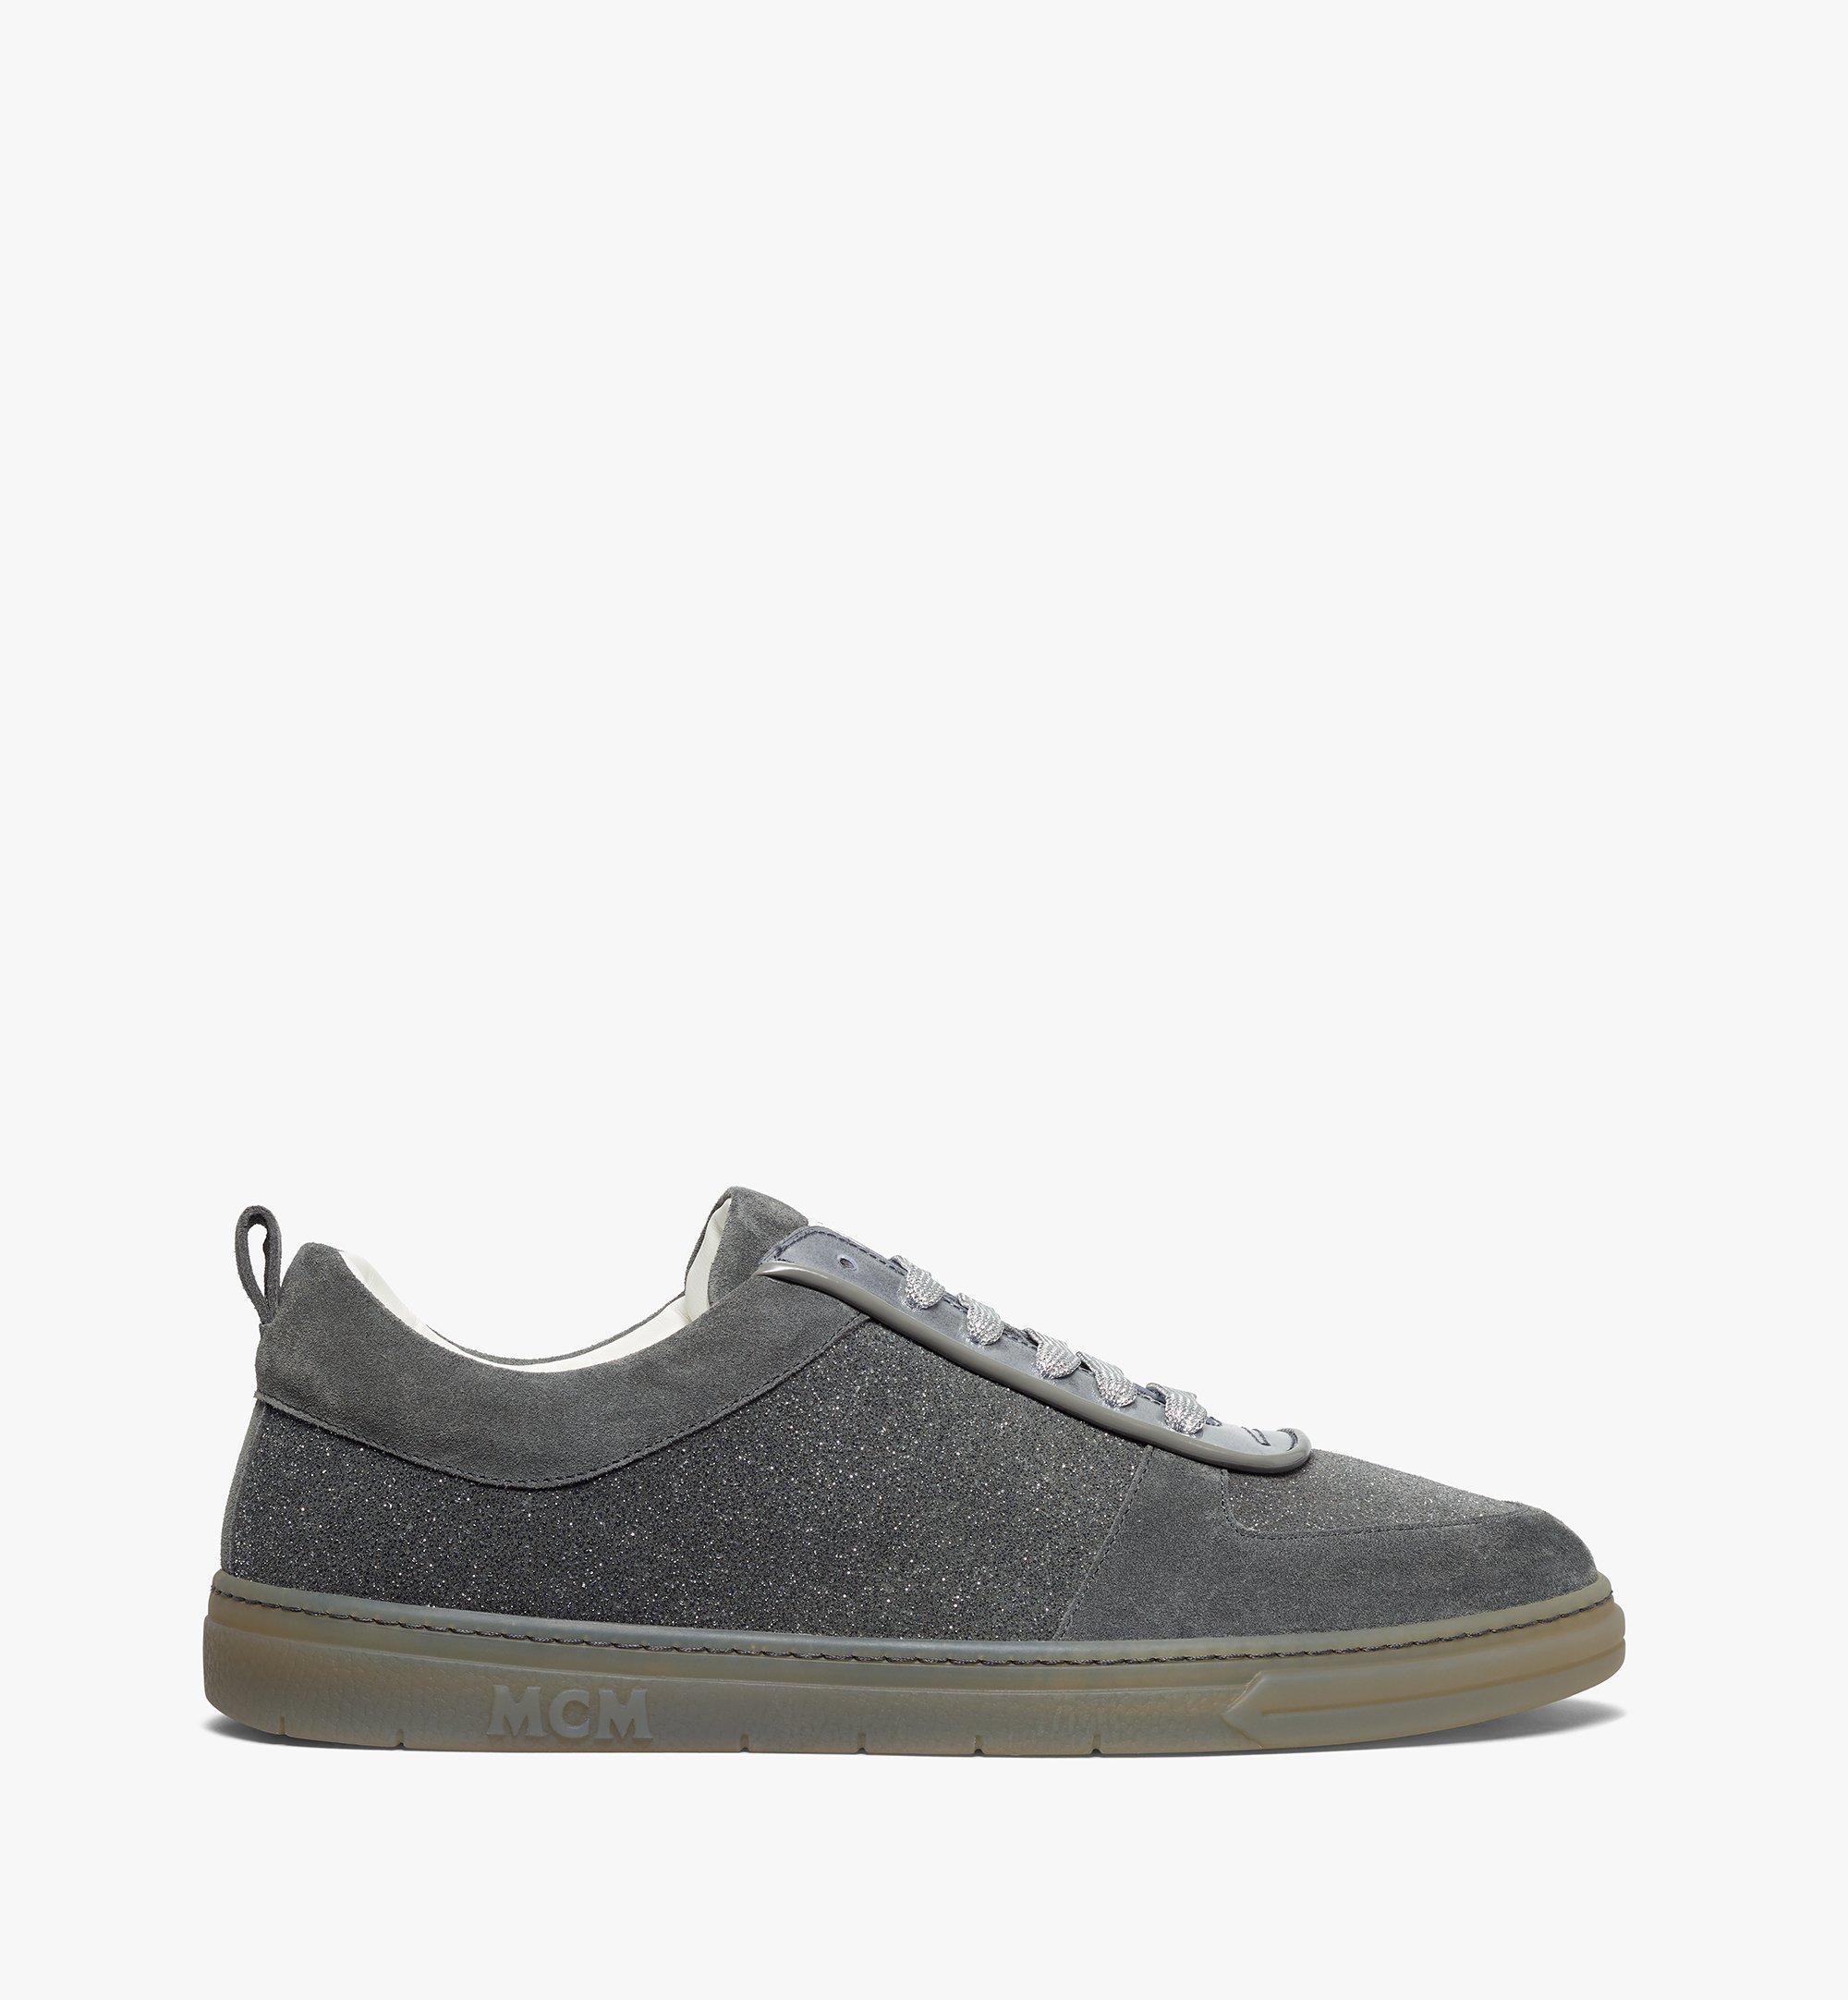 MCM Men's Terrain Lo Sneakers in Multi-Suede Leather Grey MEXBSMM06EO041 Alternate View 3